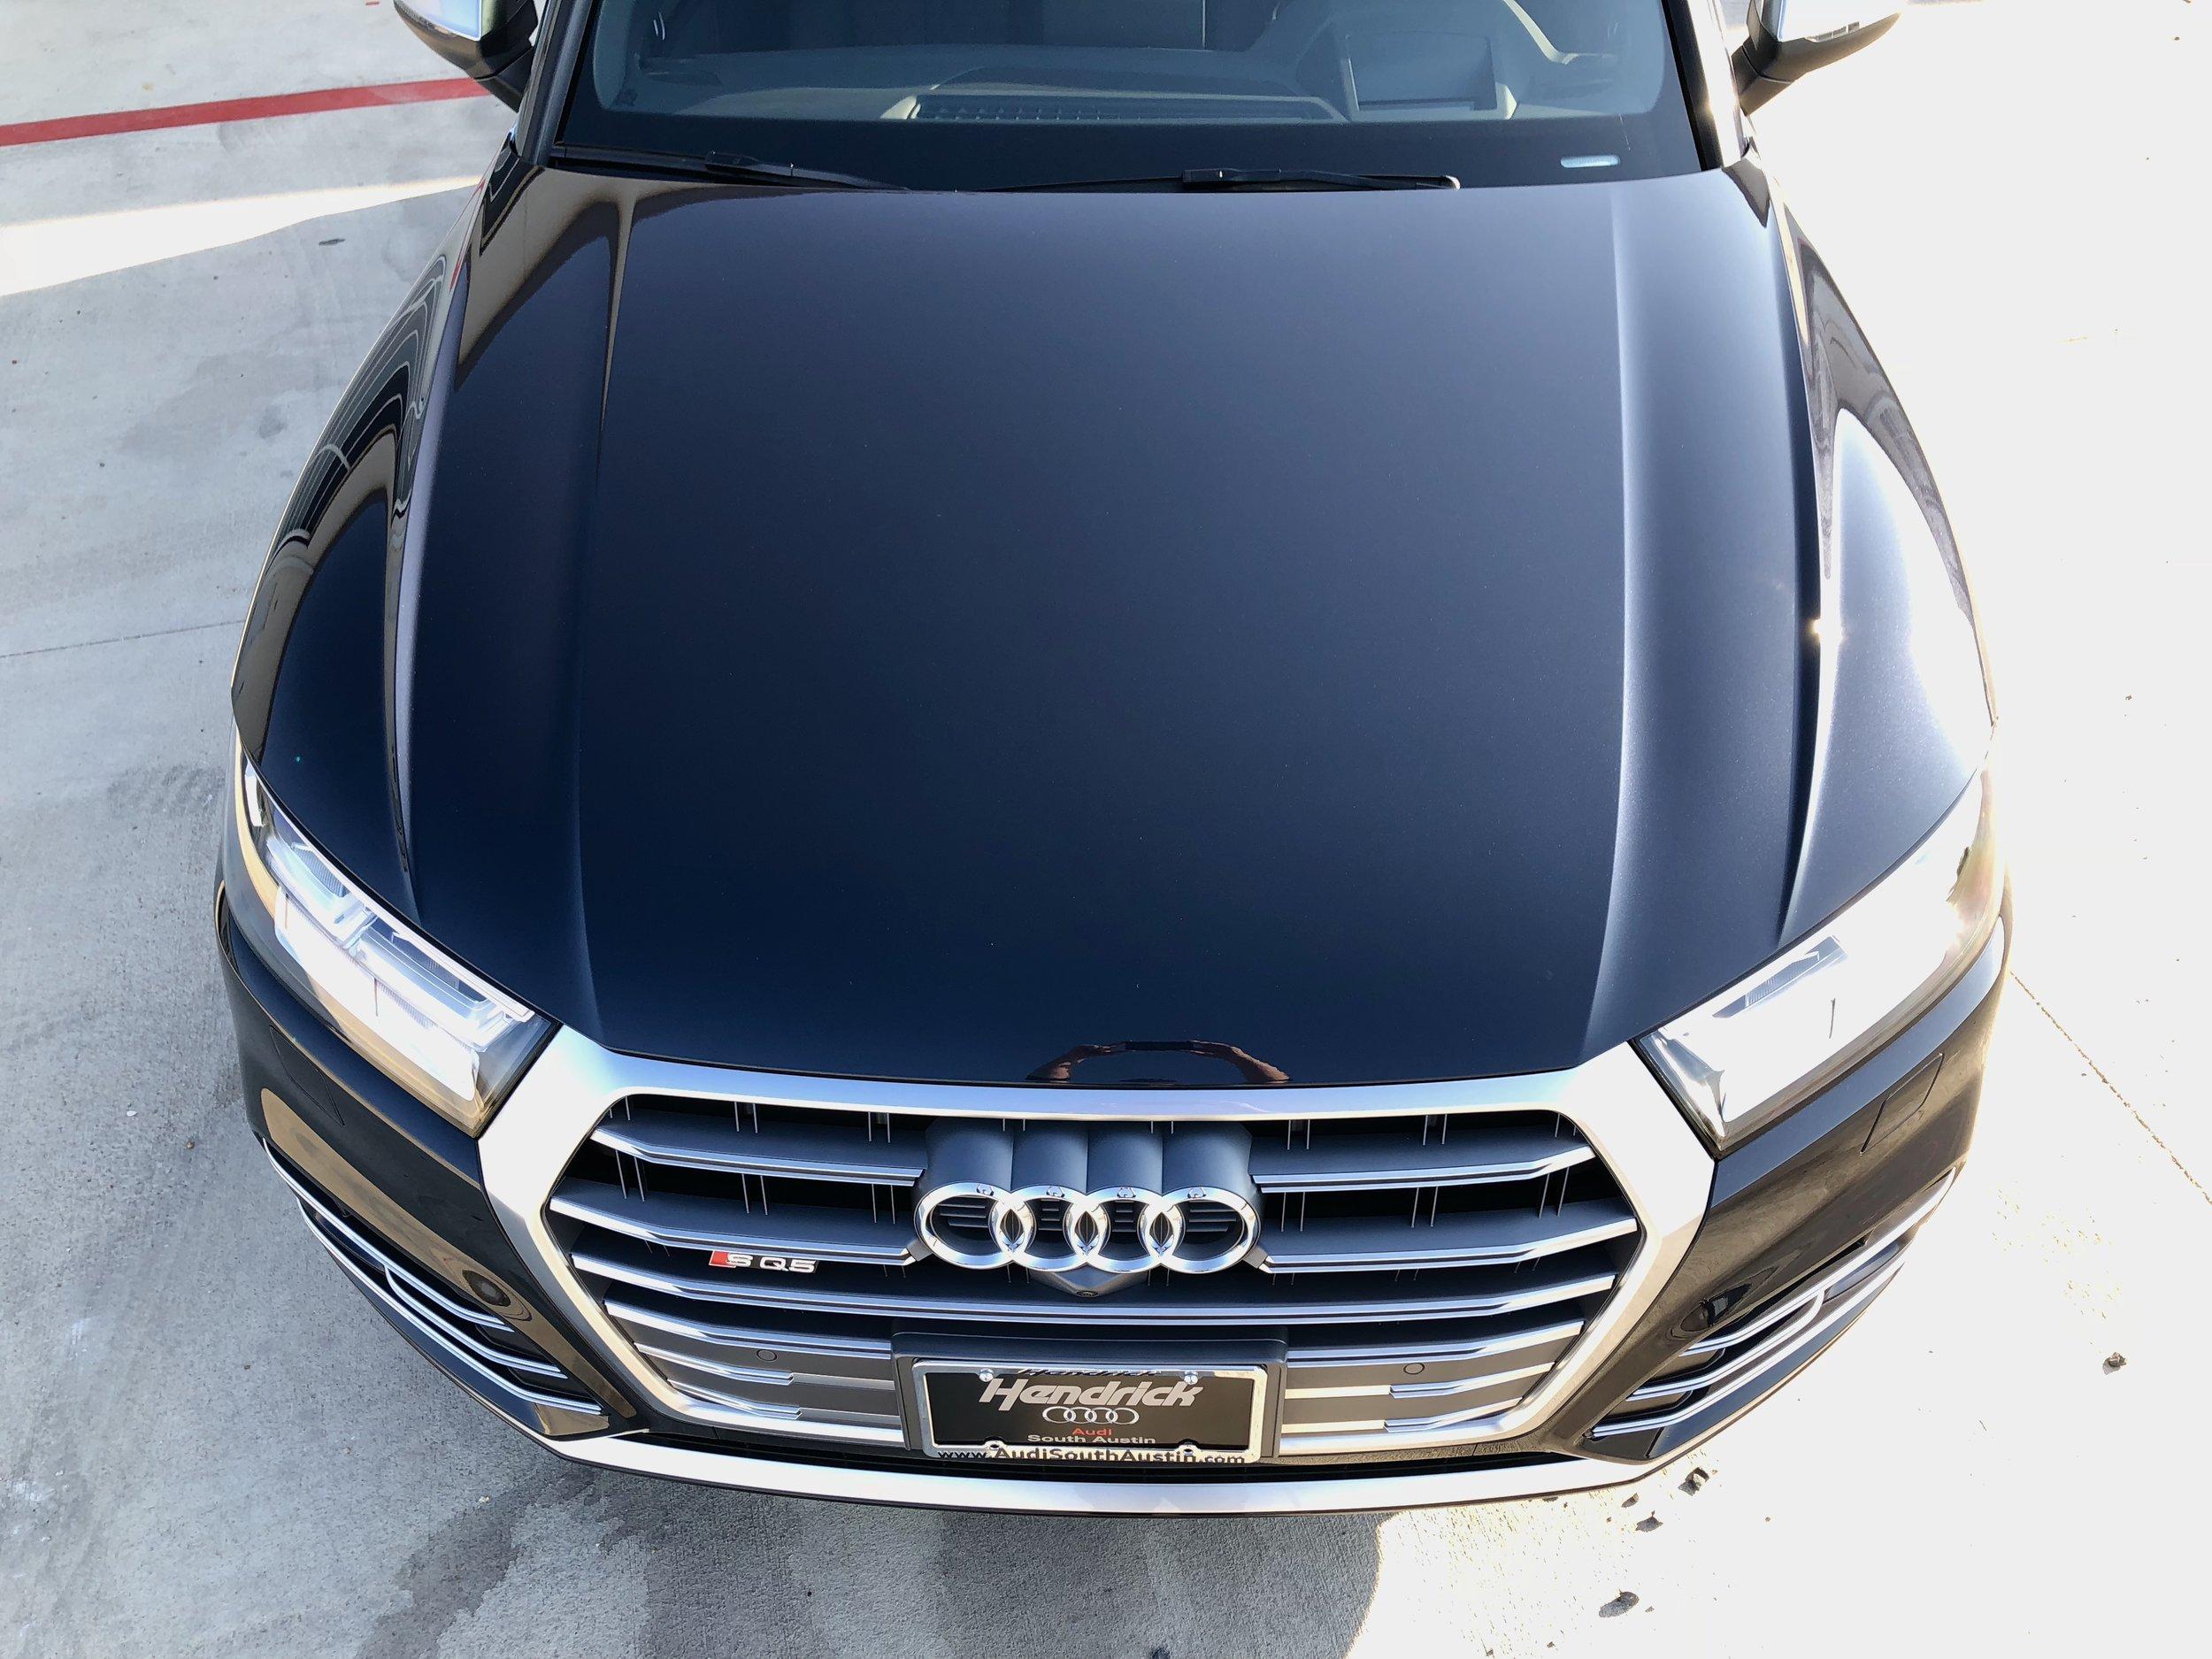 Audi SQ5 Paint Protection